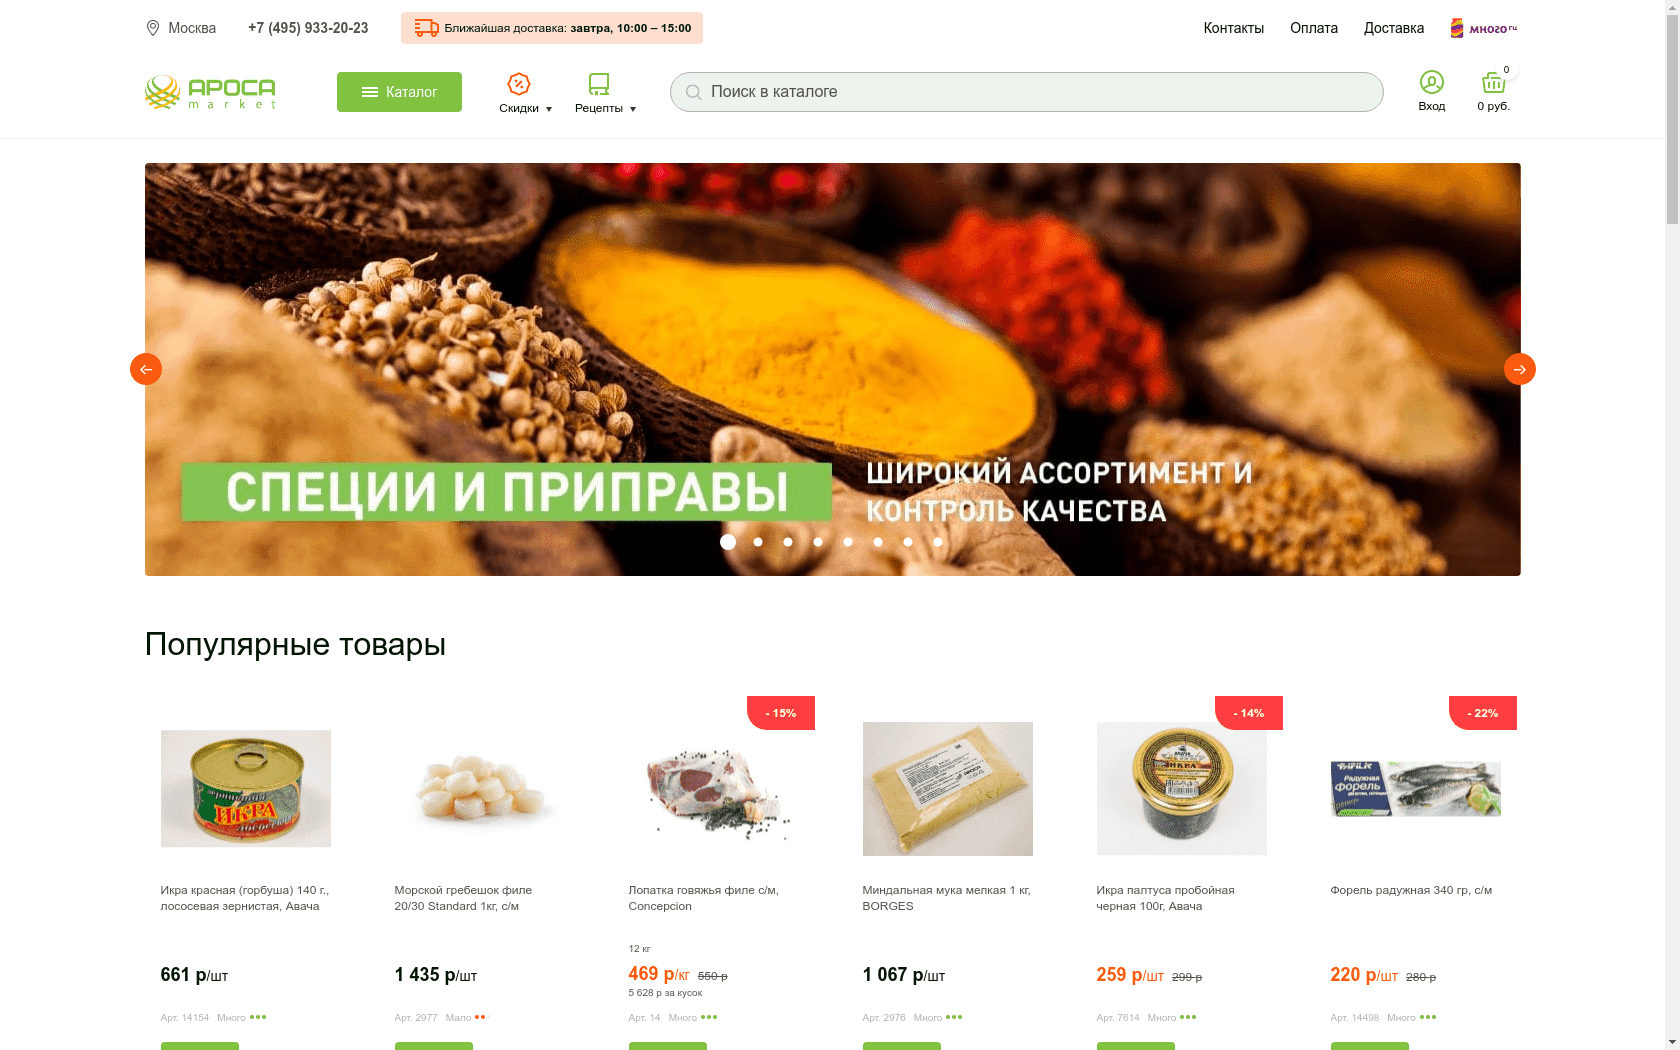 АРОСА Маркет